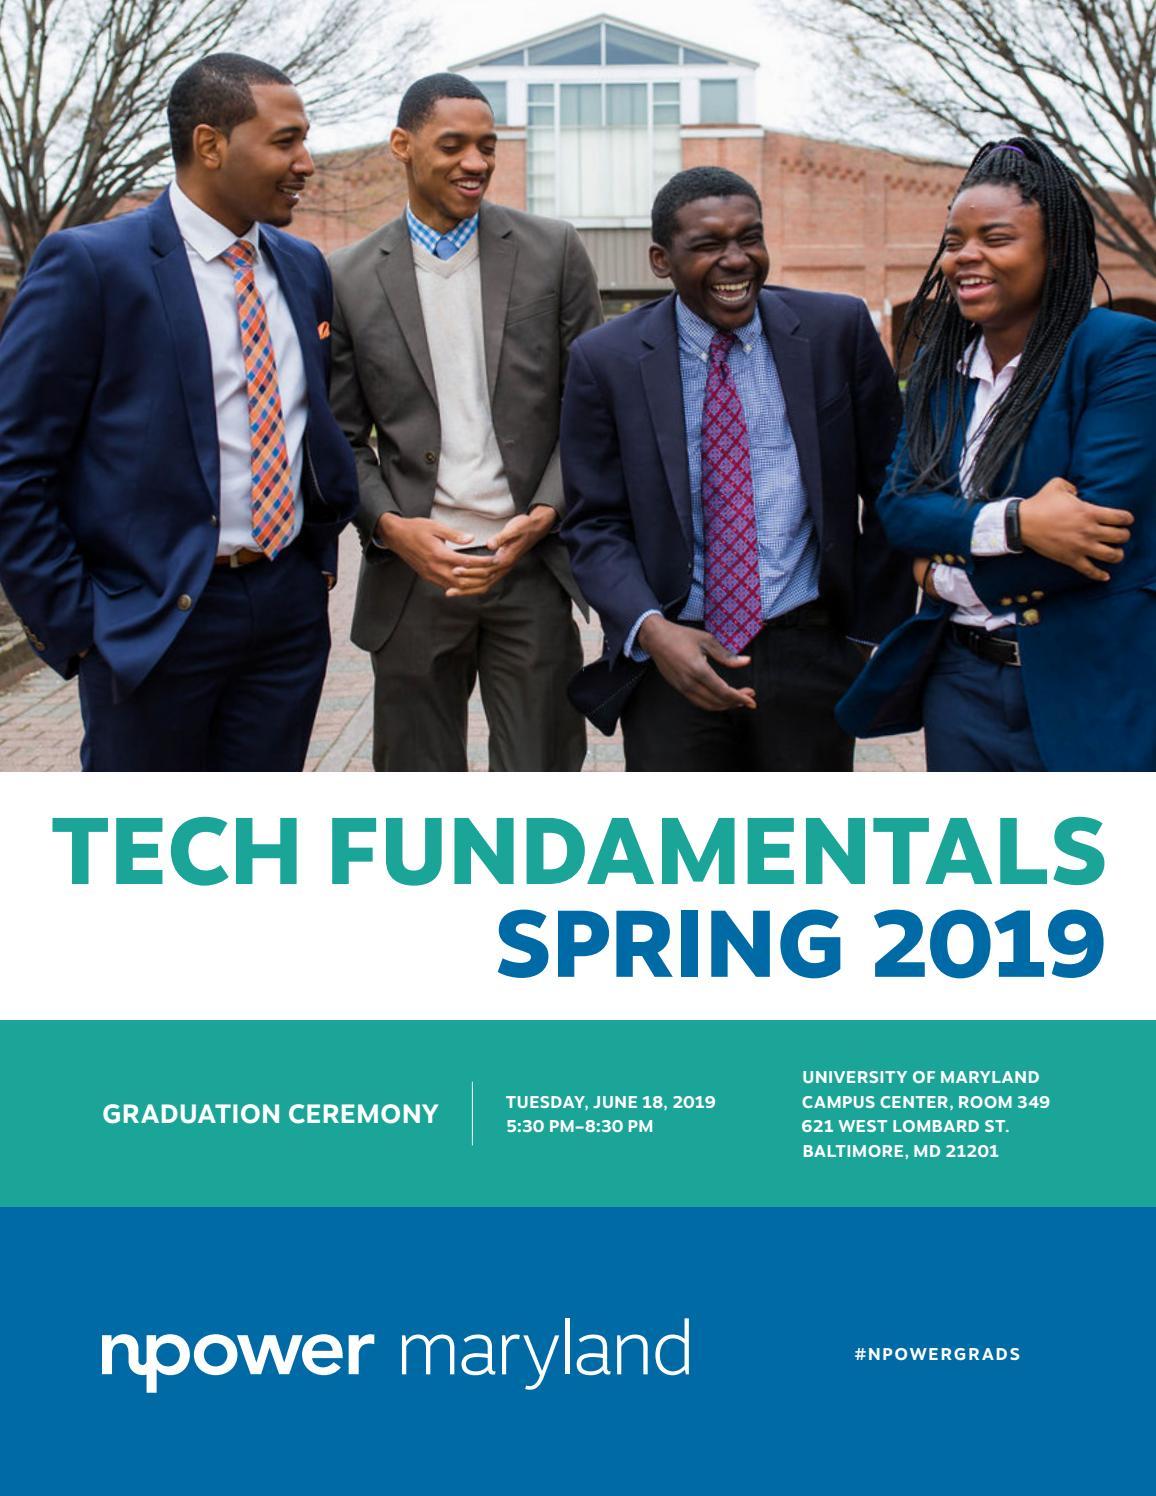 NPower Maryland Tech Fundamentals Spring 2019 by NPower - issuu